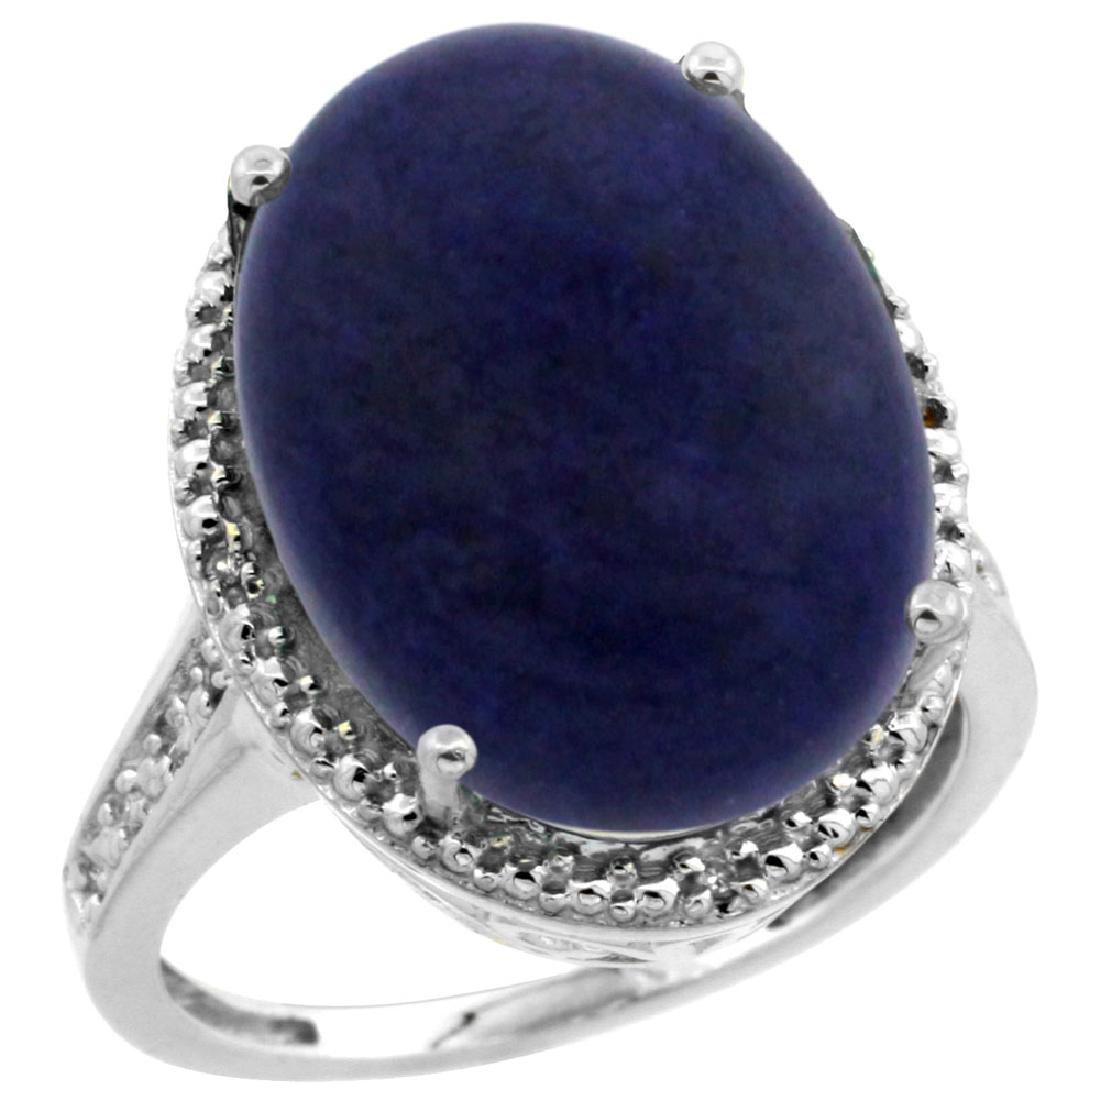 Natural 9.49 ctw Lapis & Diamond Engagement Ring 14K